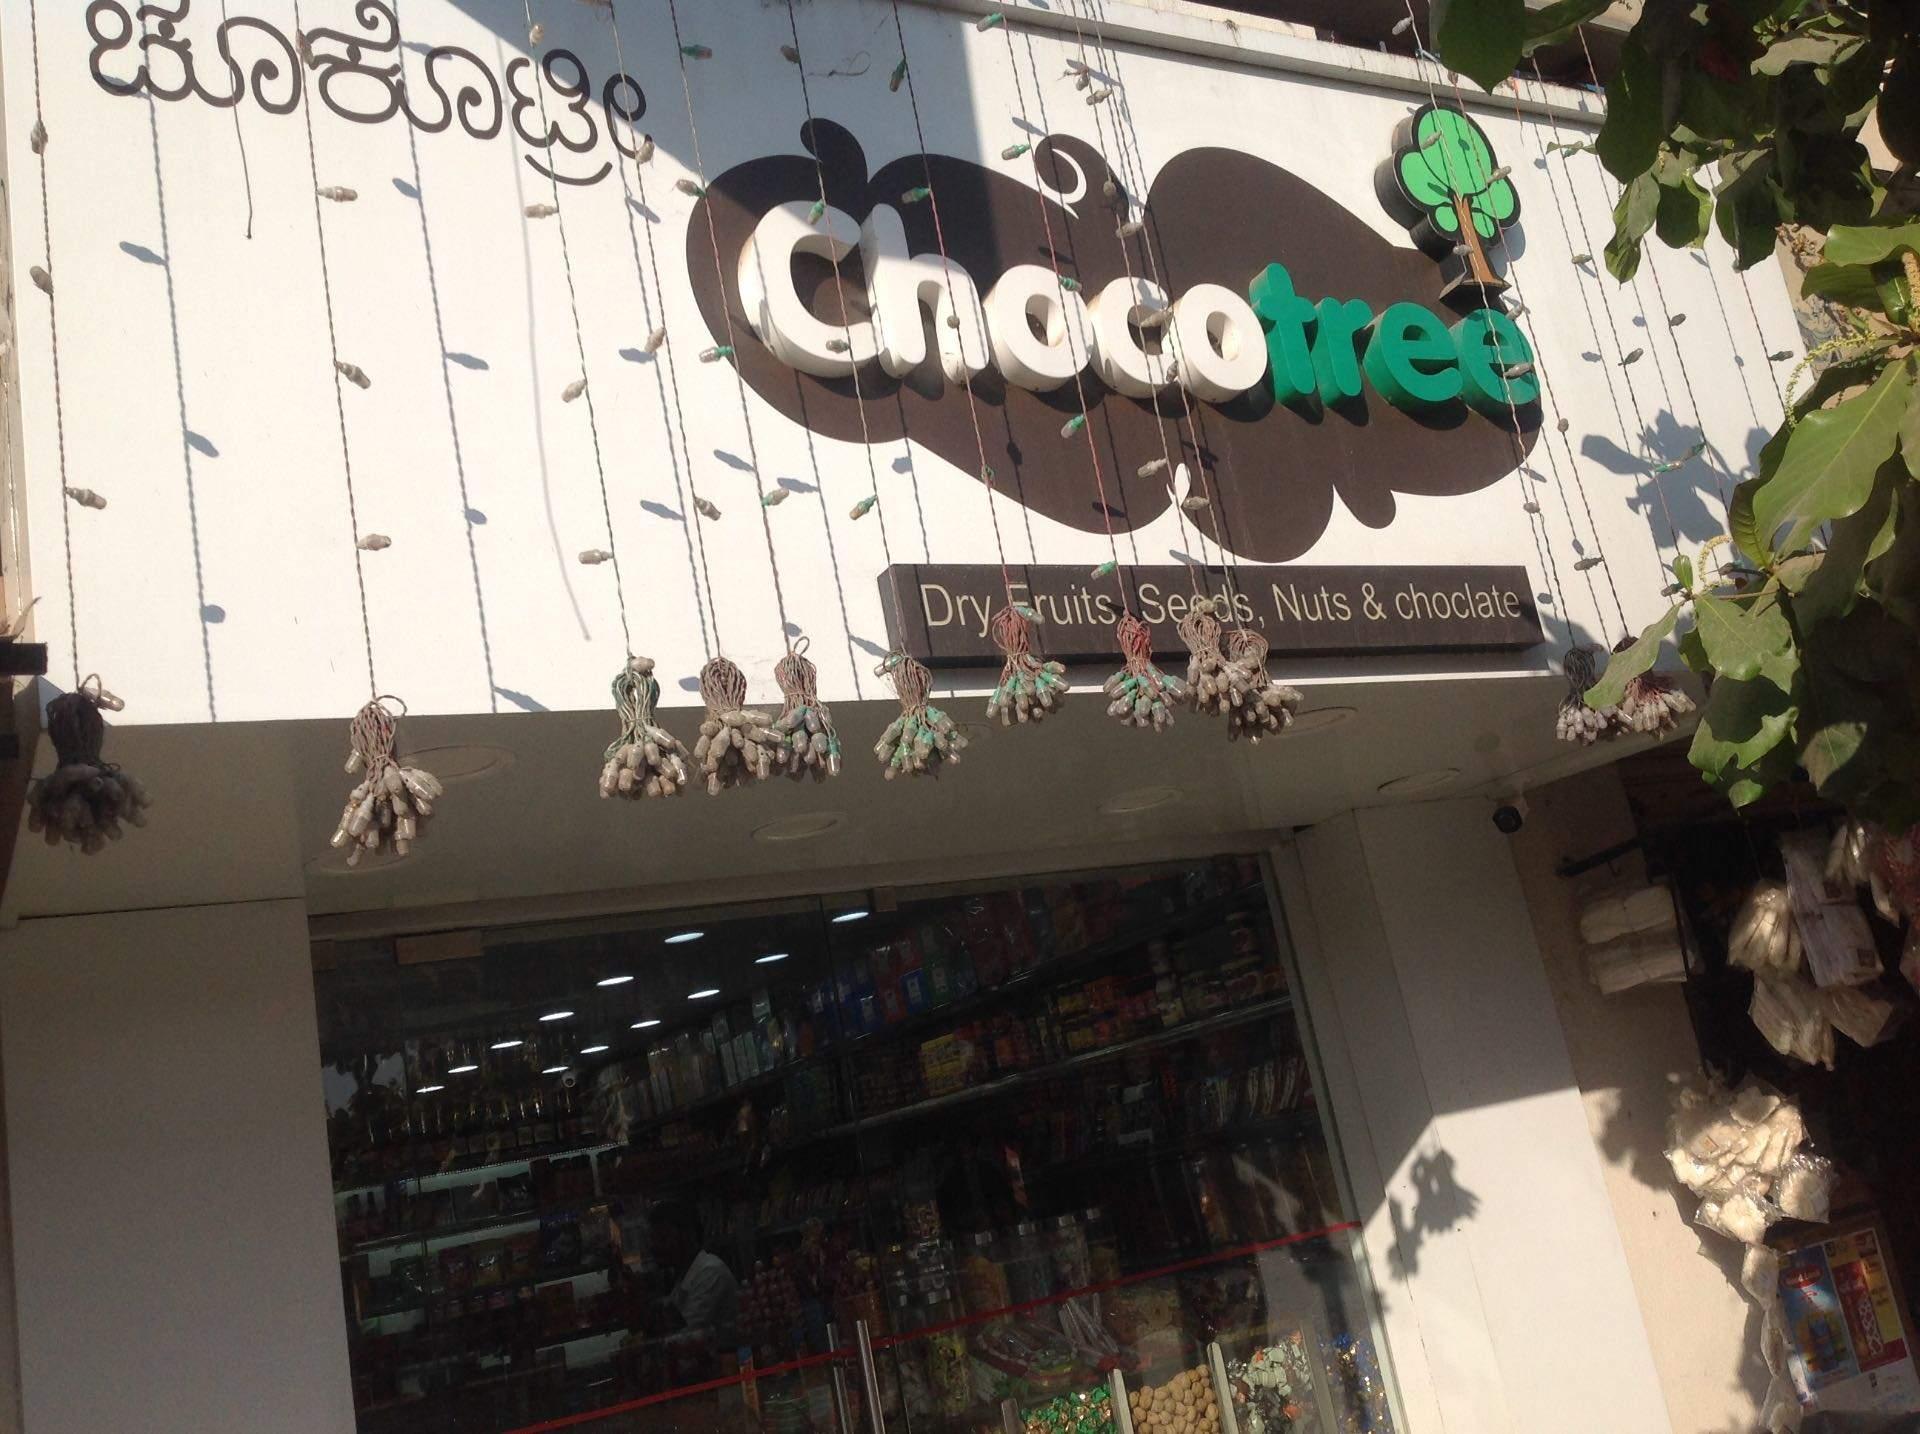 Top 100 Betel Nut Retailers in Bangalore - Best Supari Retailers